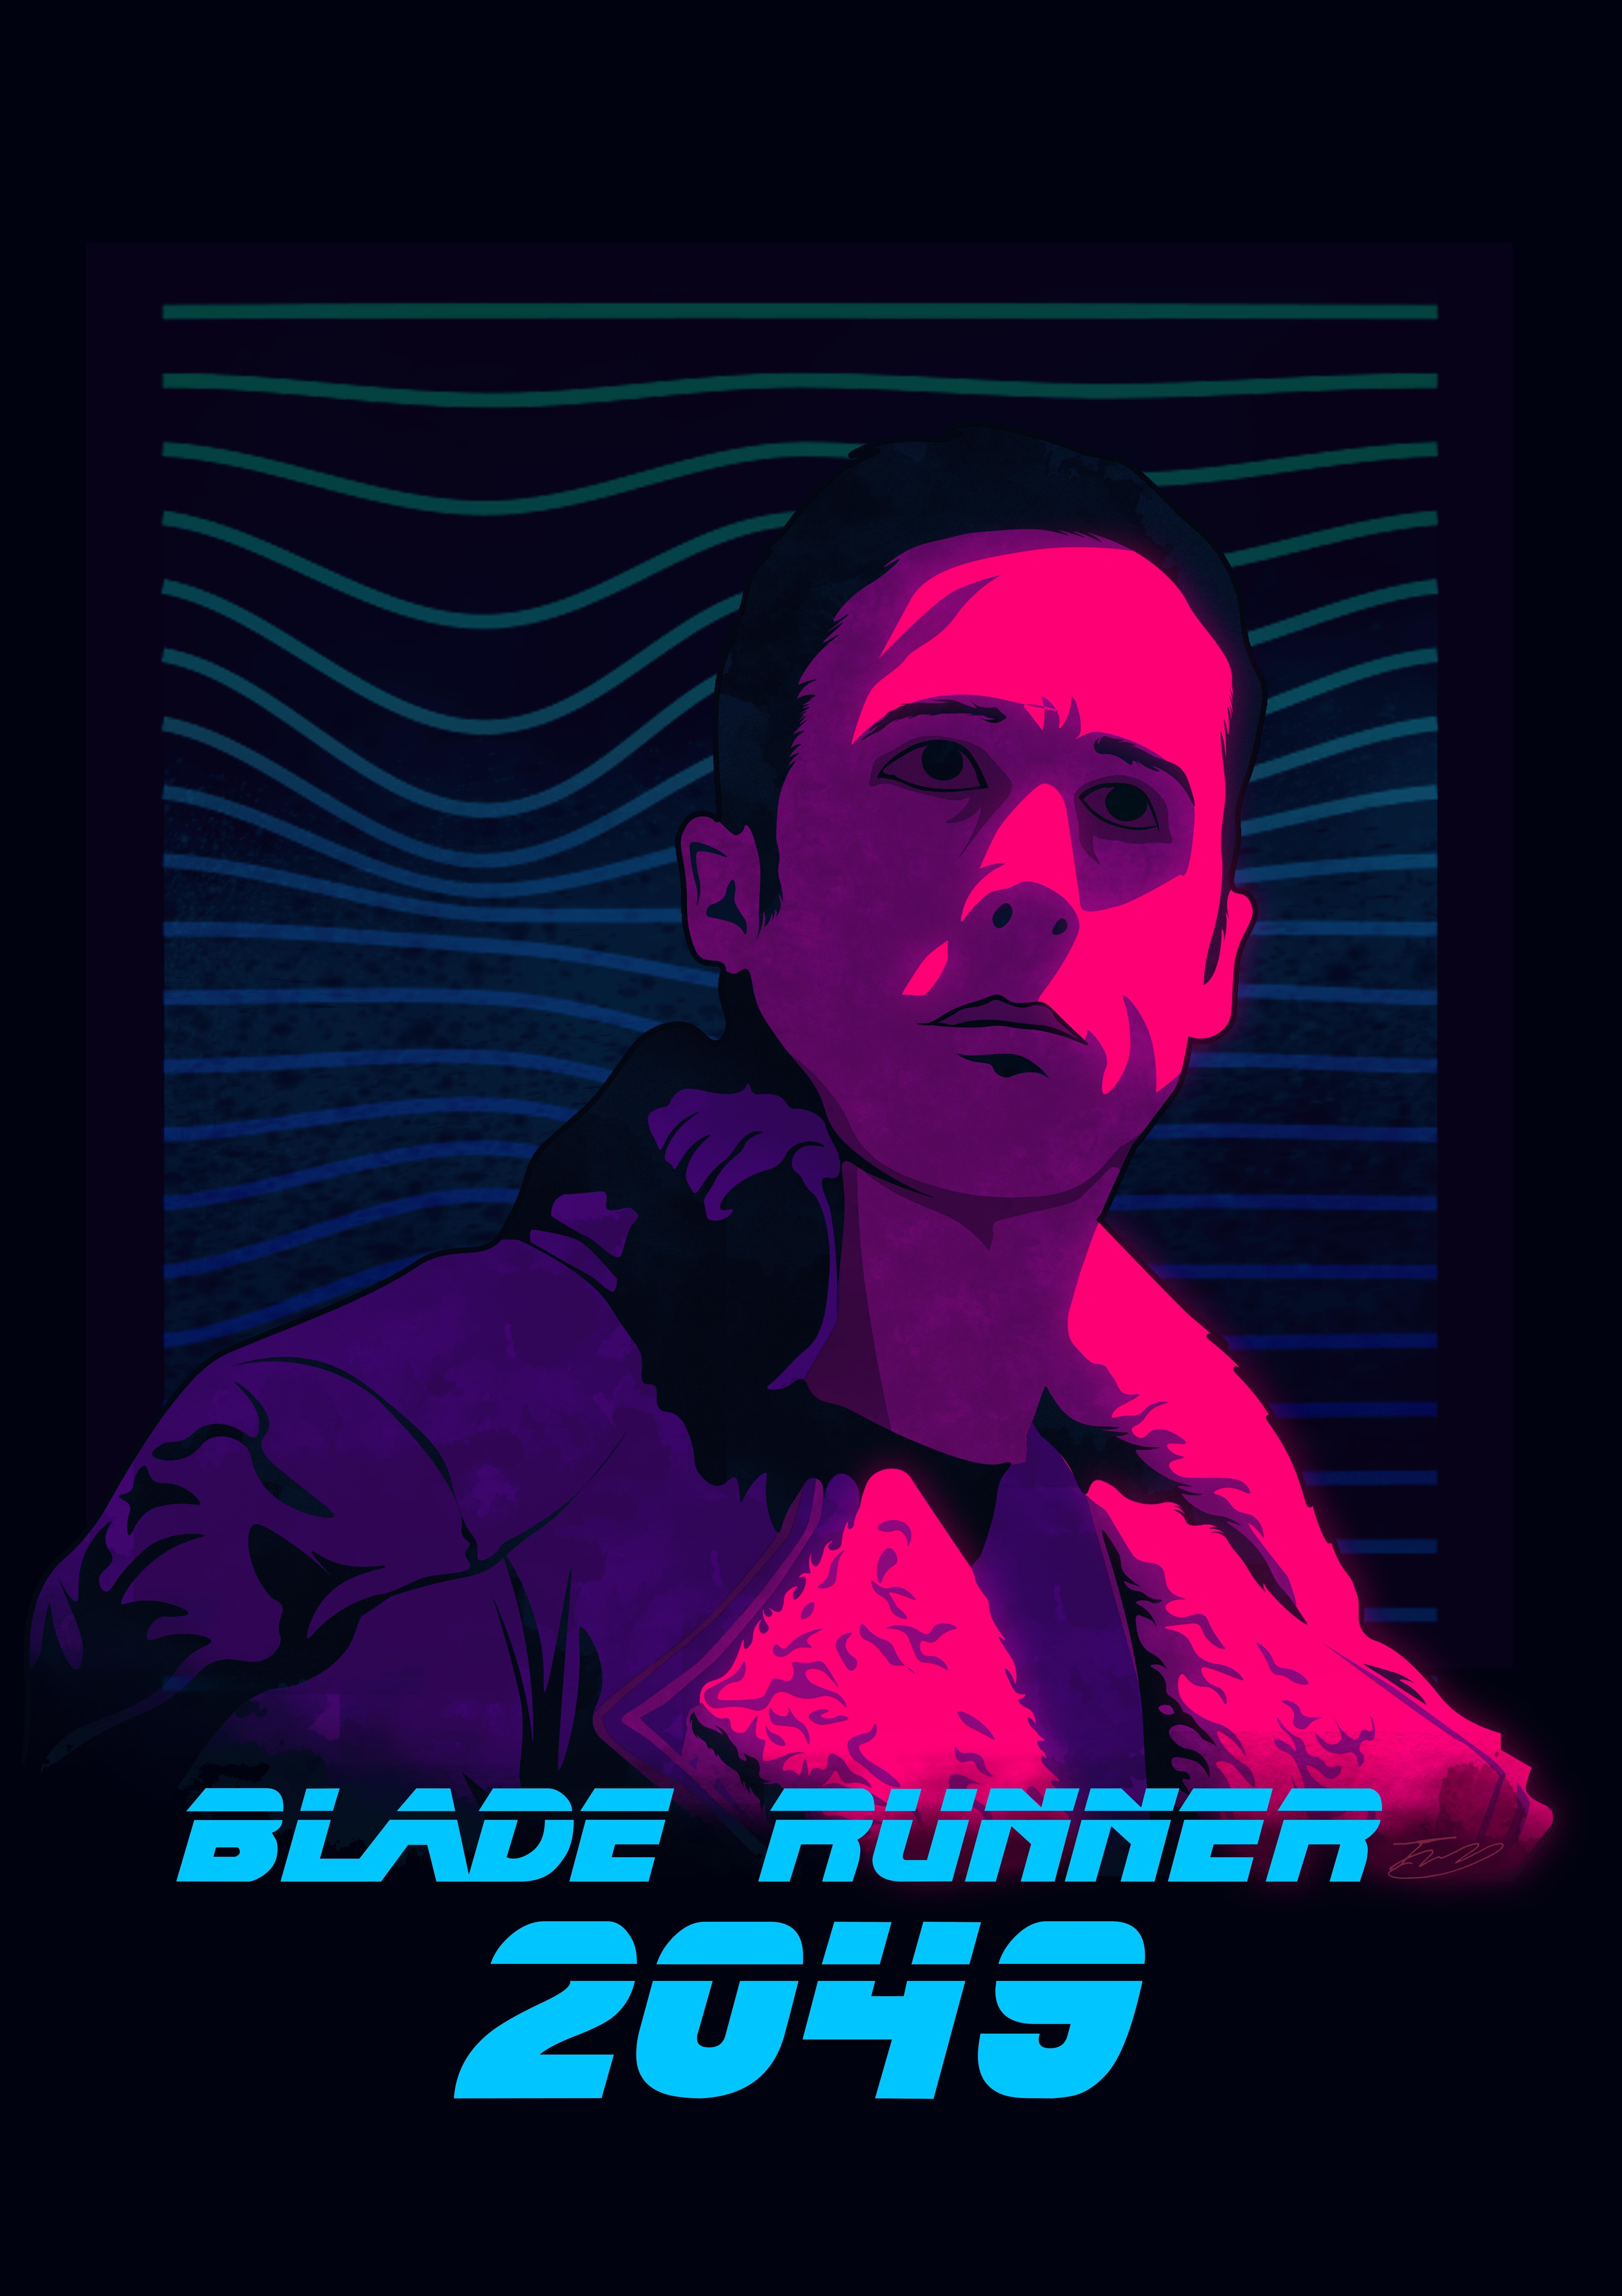 Blade Runner 2049 Poster Digital Art 594 X 841 Art Blade Runner Digital Art